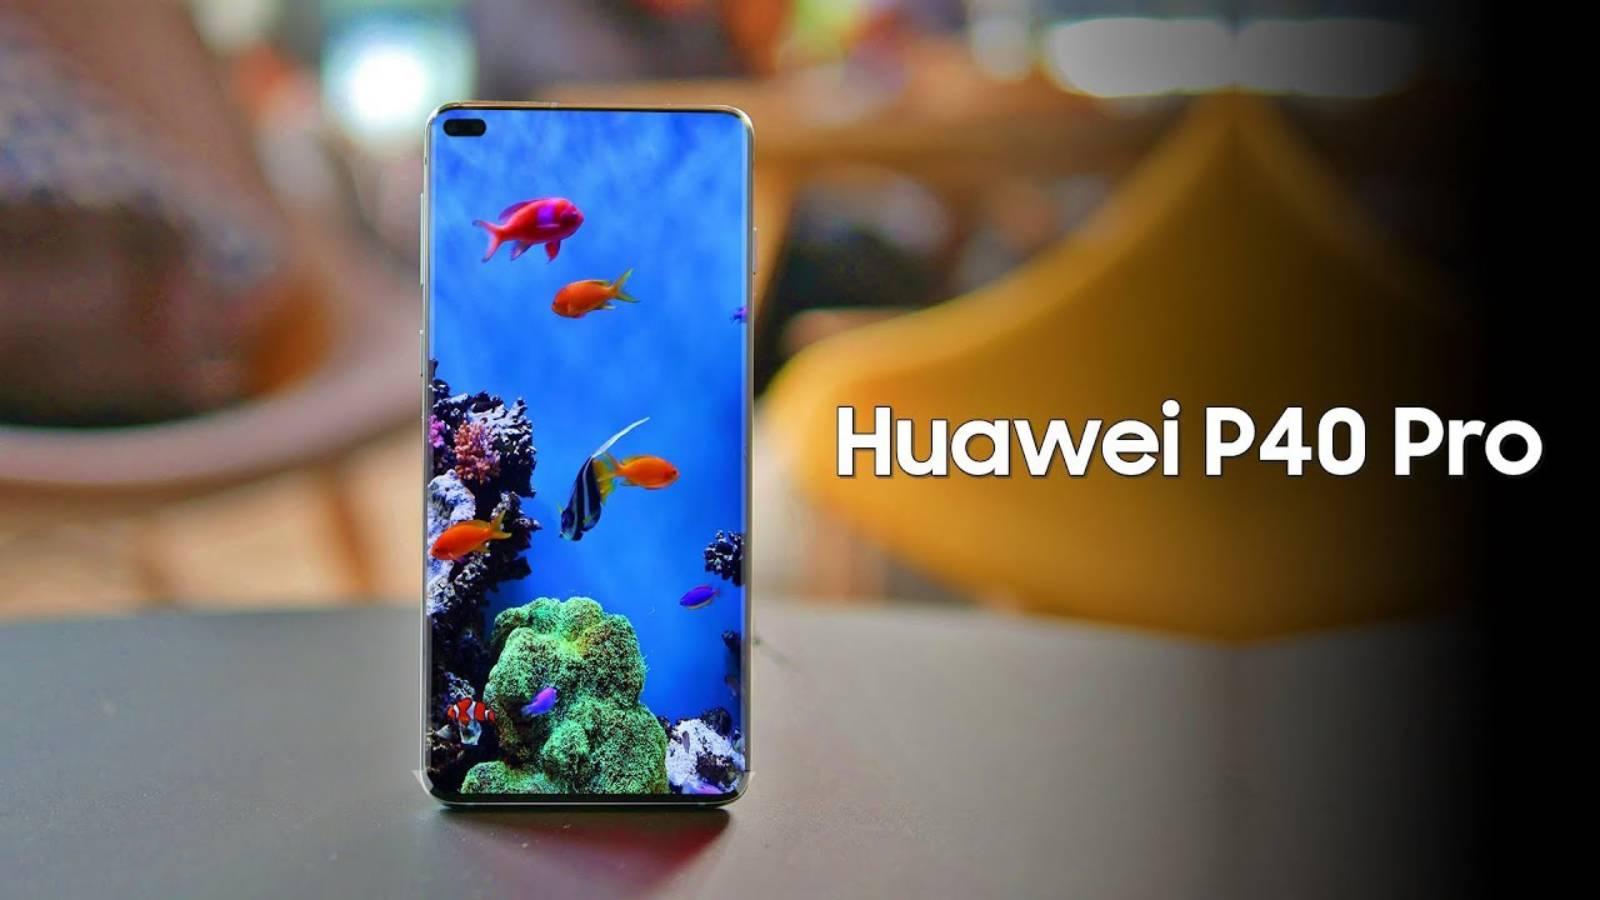 Huawei P40 Pro ieftin p30 pro